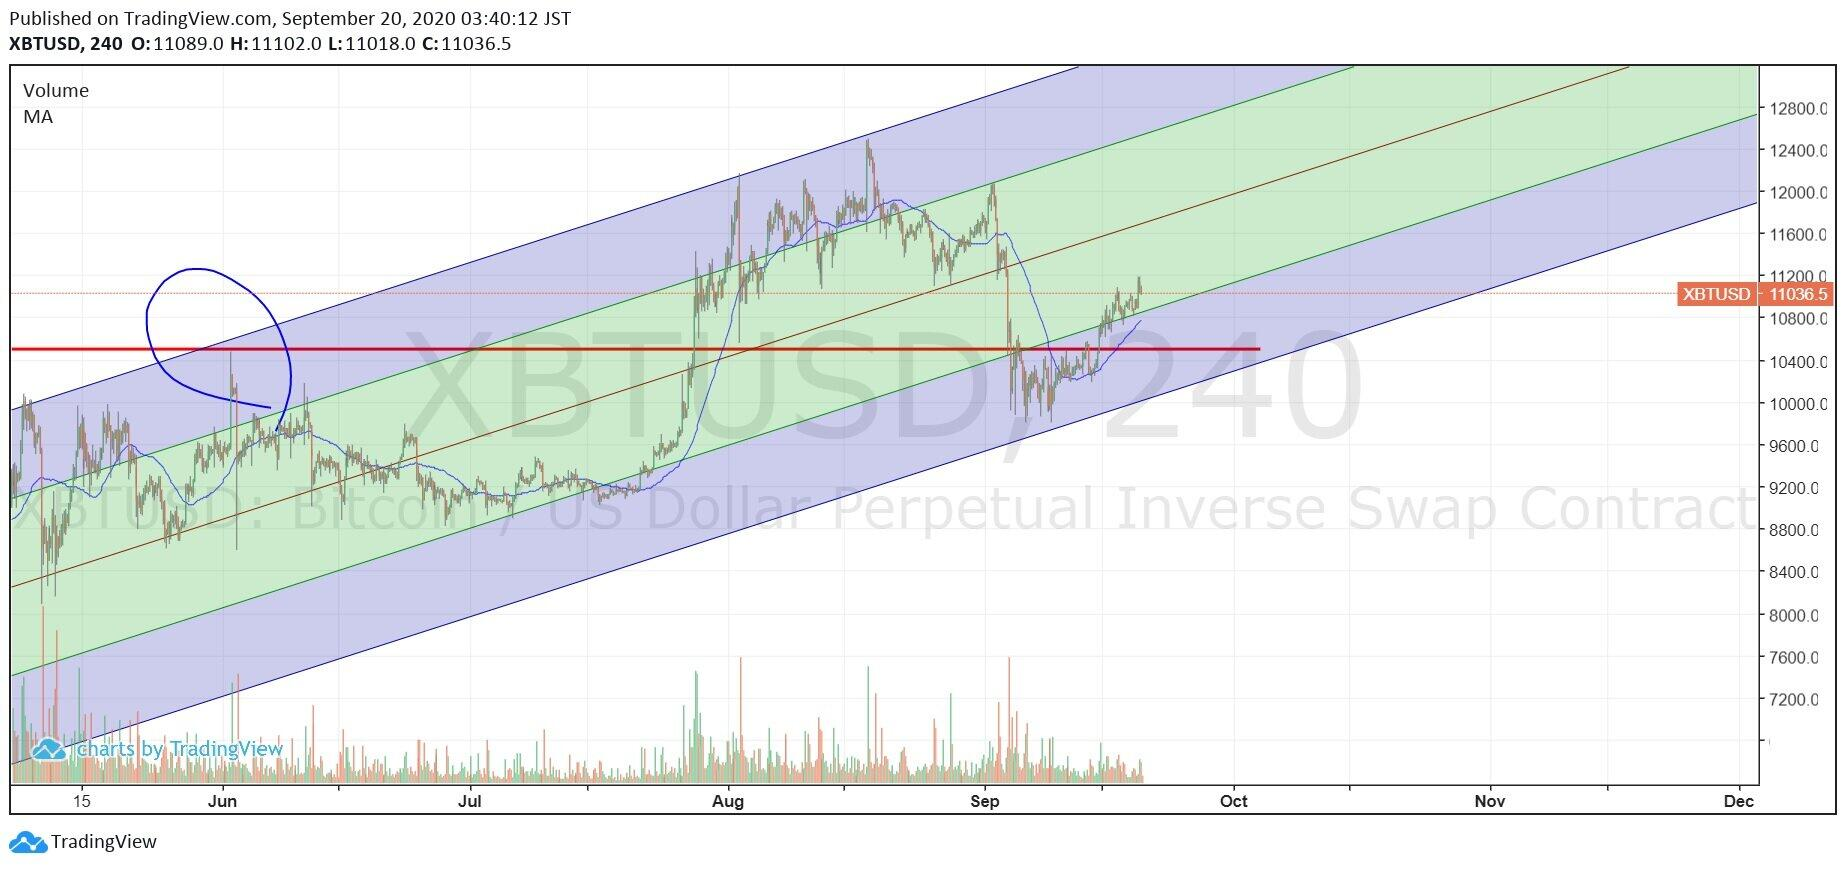 (図1) https://www.tradingview.com/x/qZL7hUZu